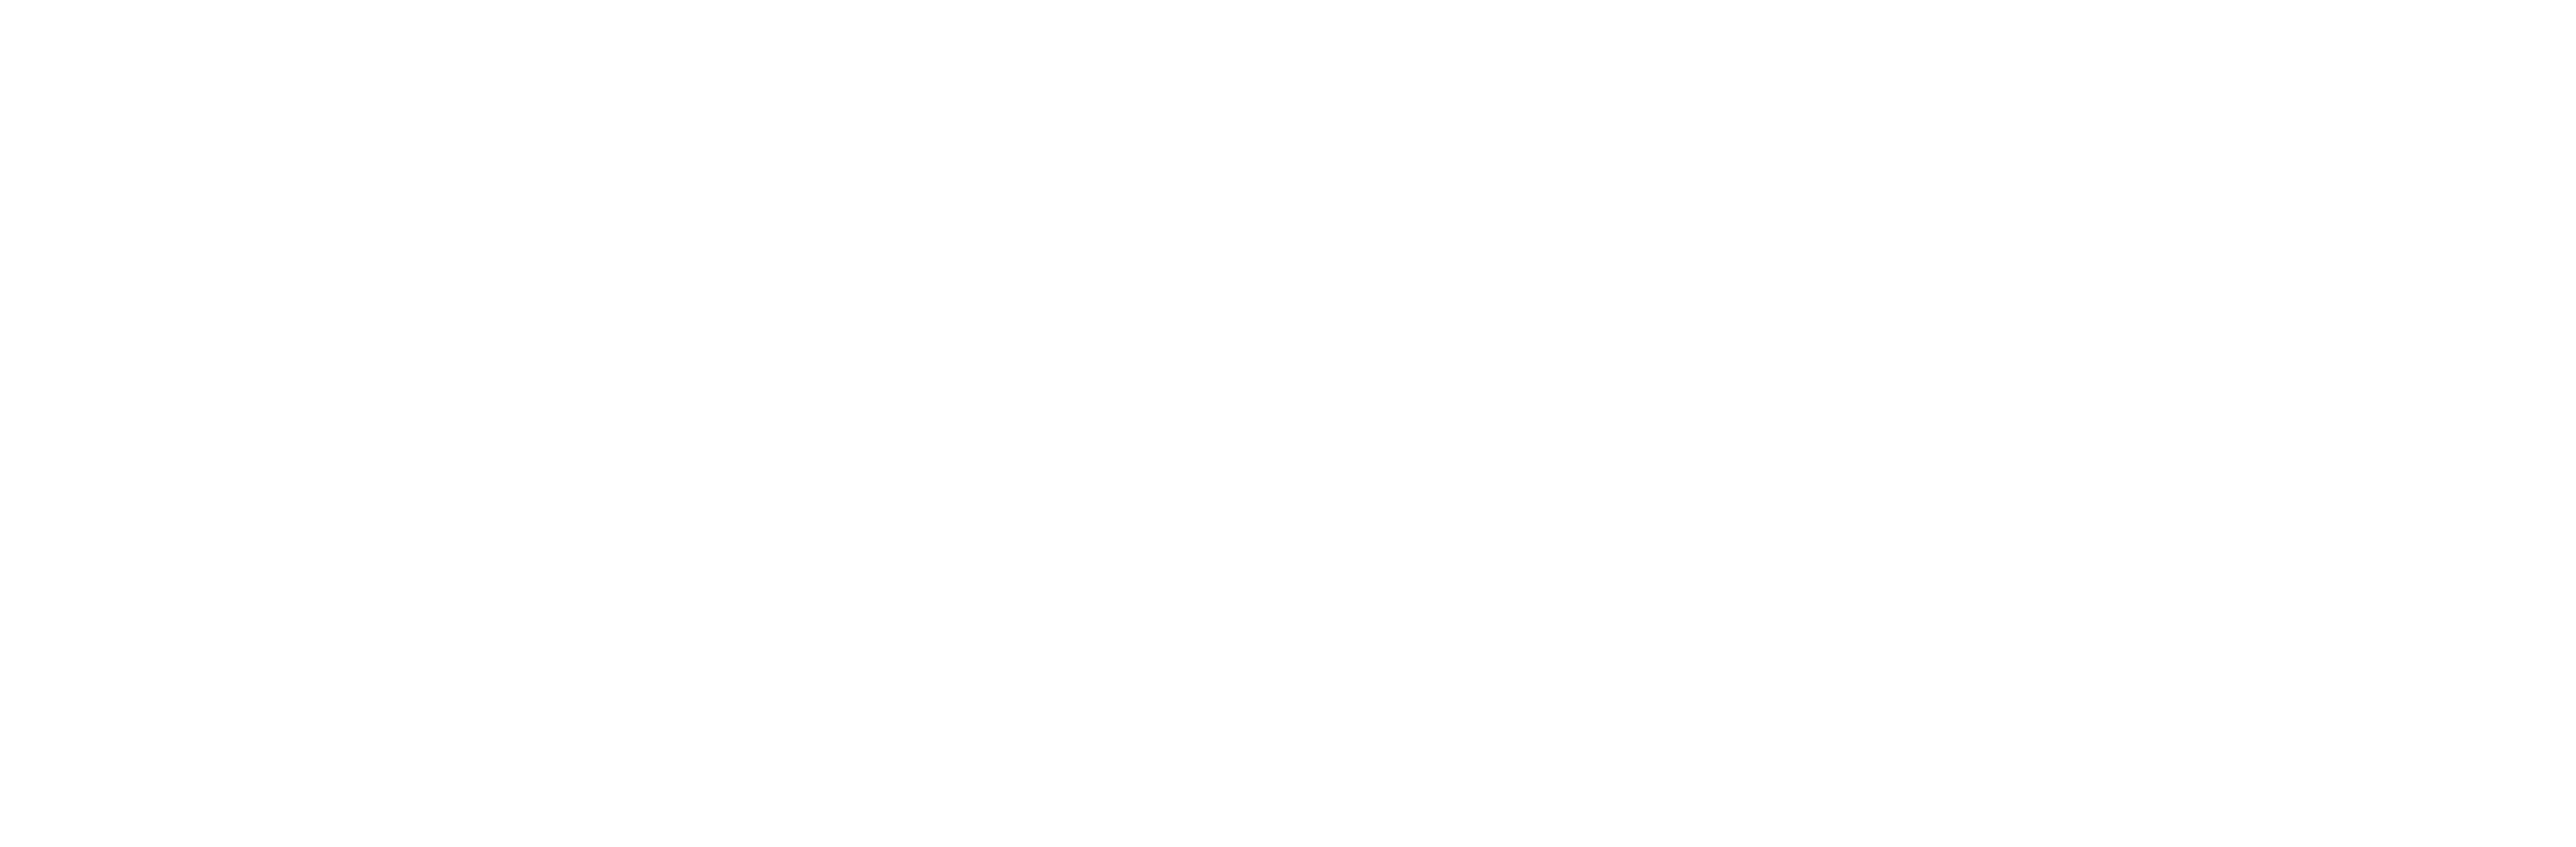 Kilpatrick Sports